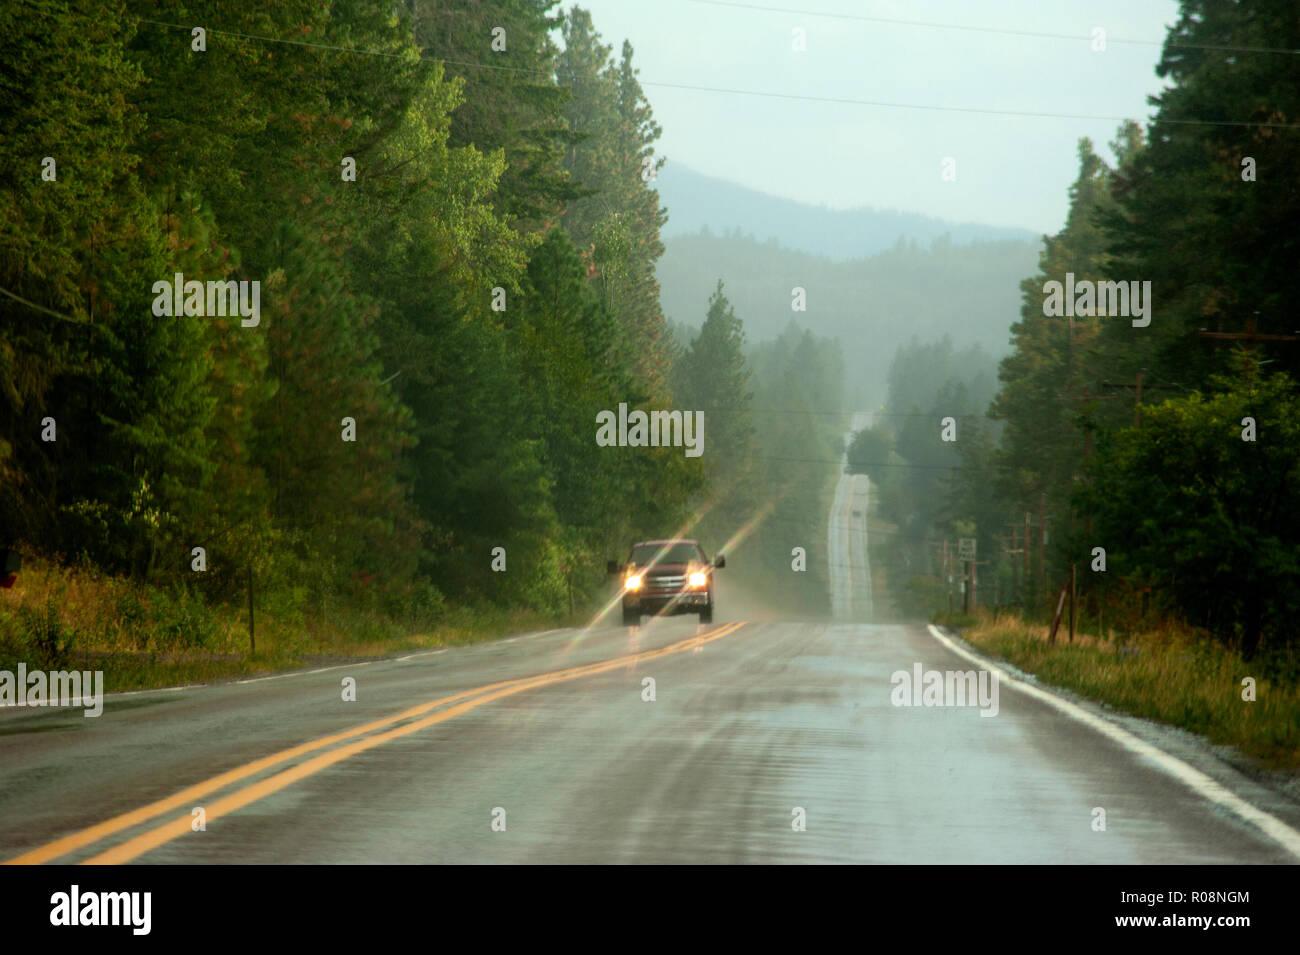 Truck driving on rain slicked road near Flathead Lake, Montana Stock Photo